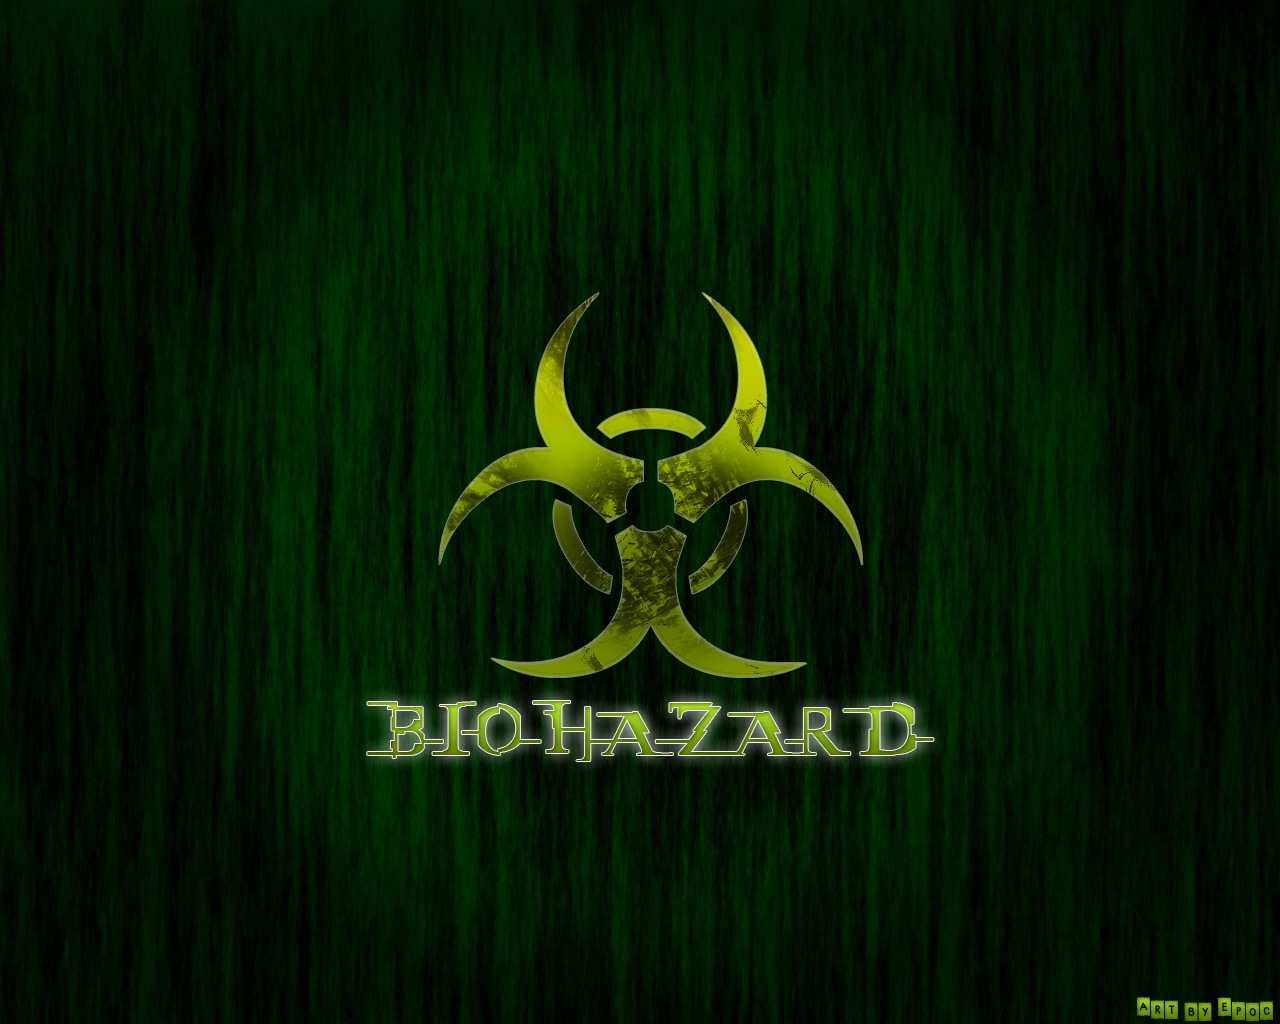 Green Biohazard Wallpaper 1280x1024 Green Biohazard 1280x1024